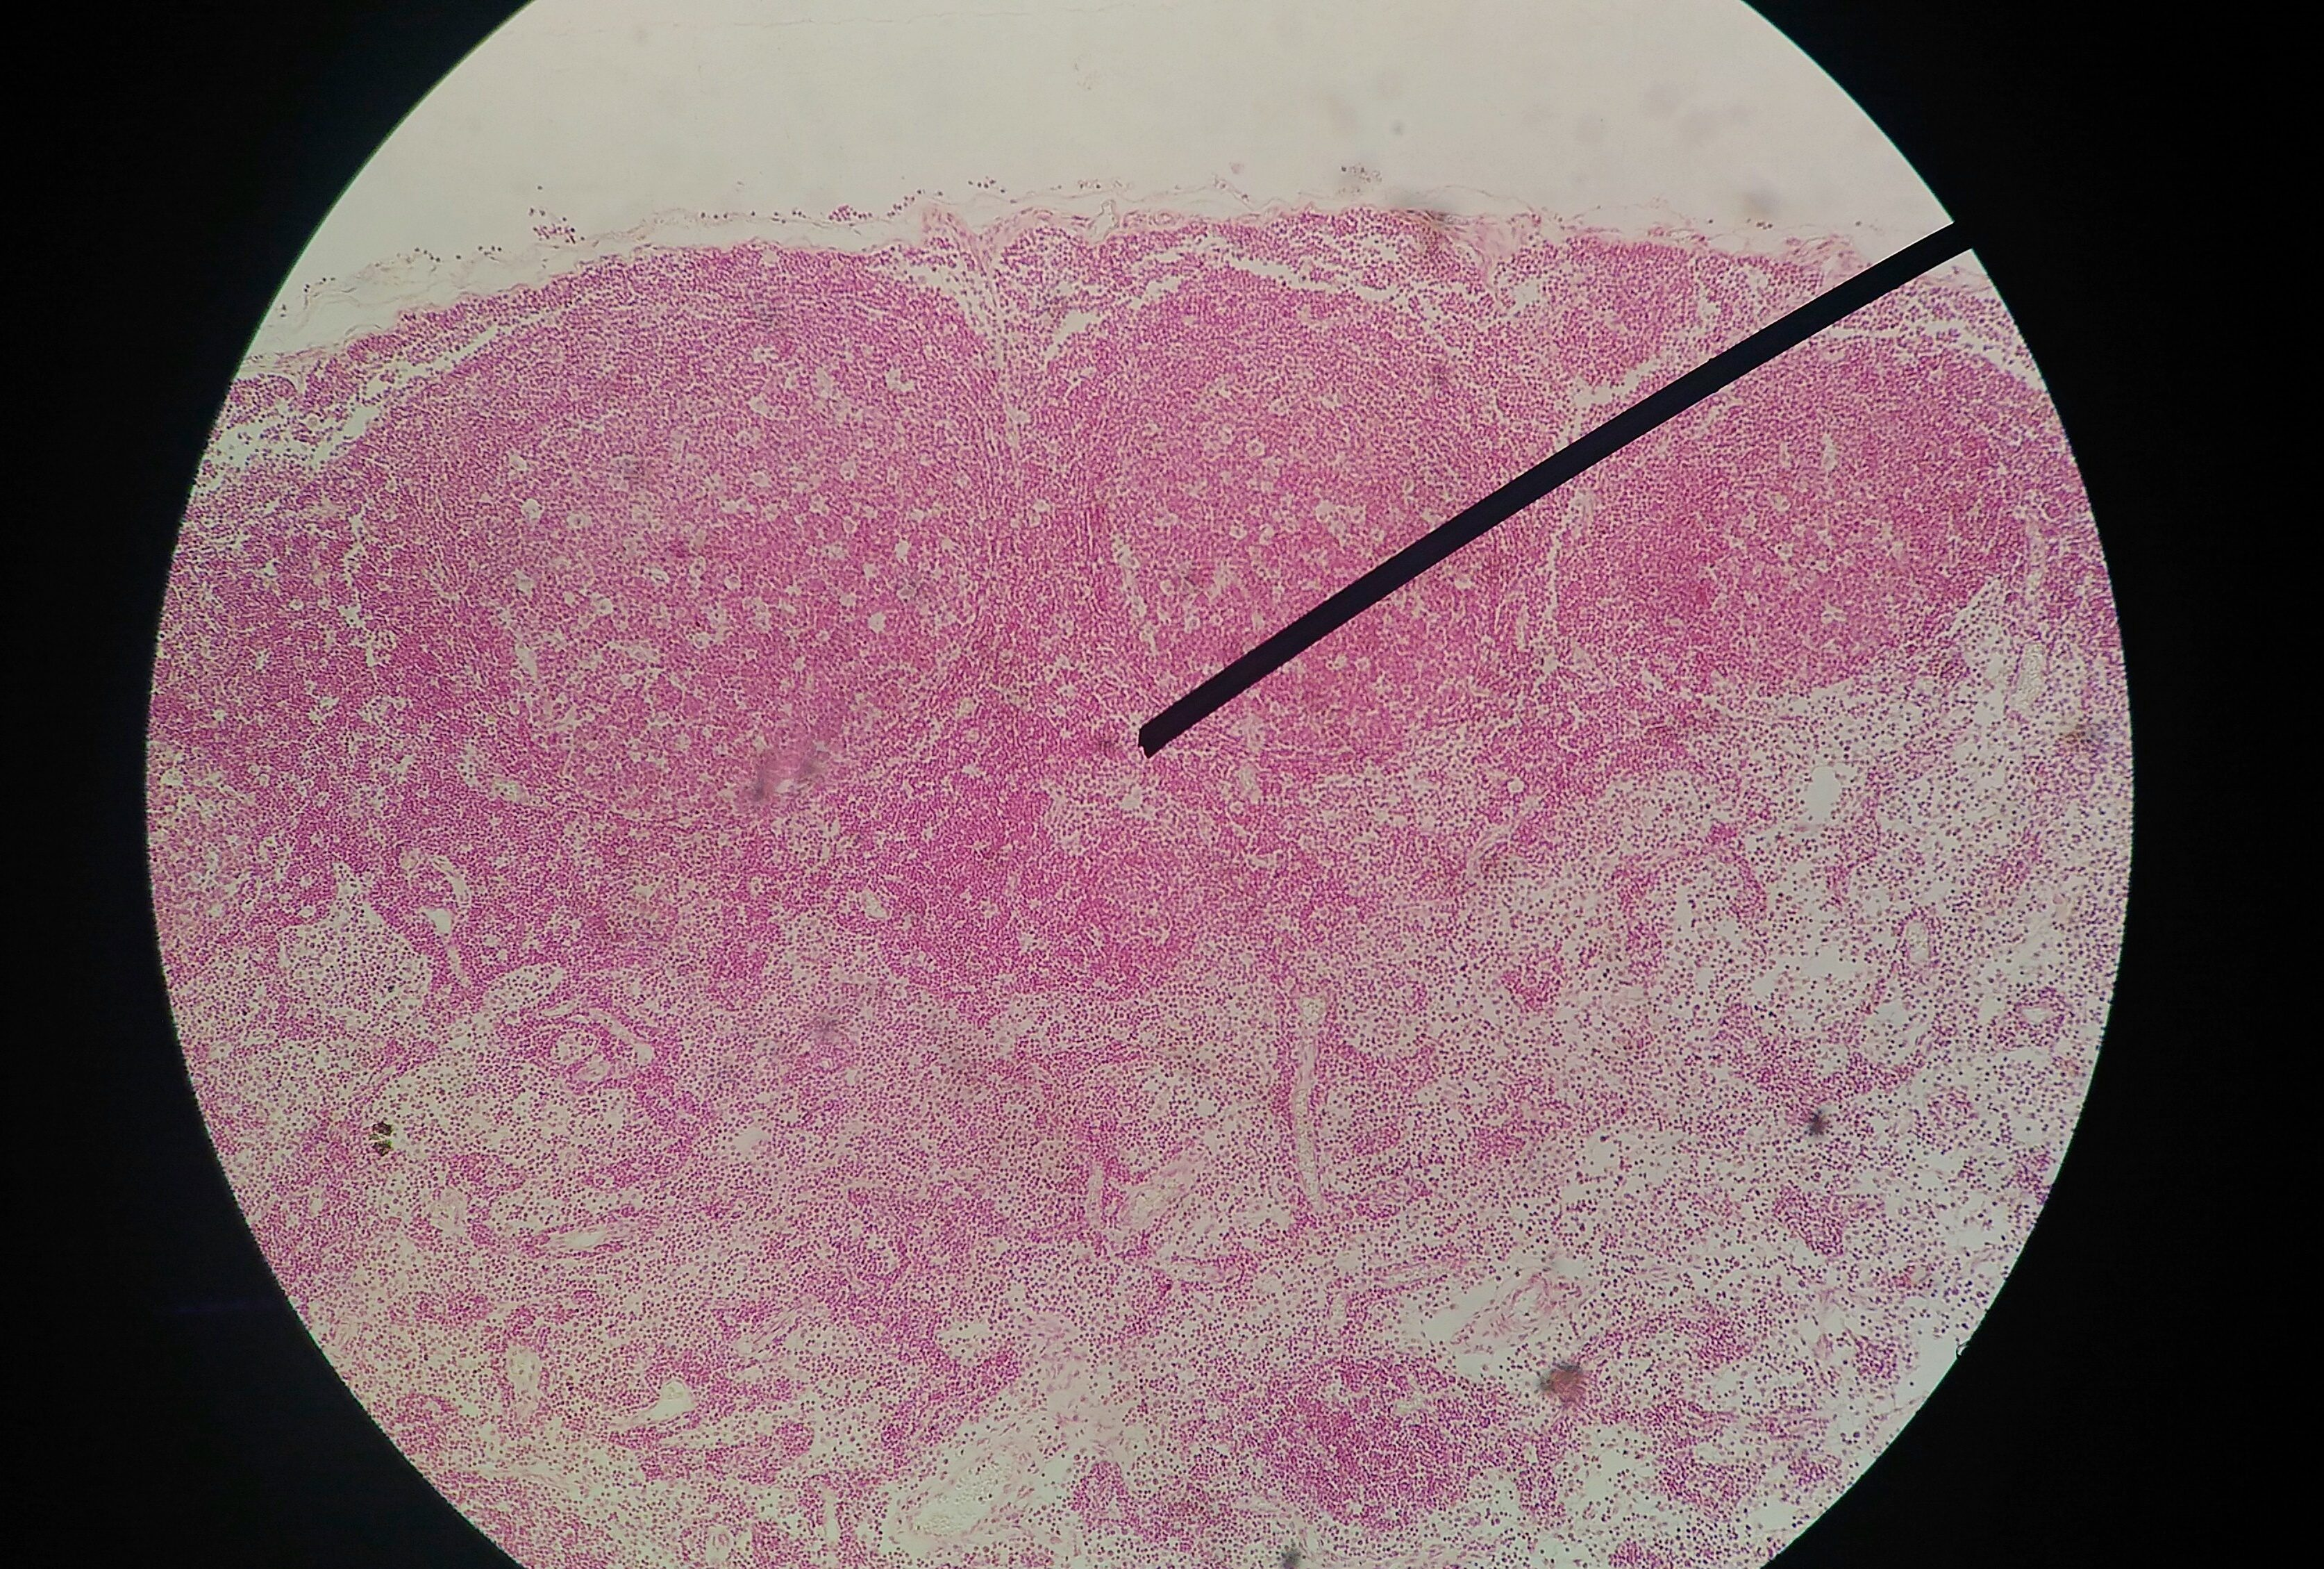 il papilloma virus risulta dal pap test